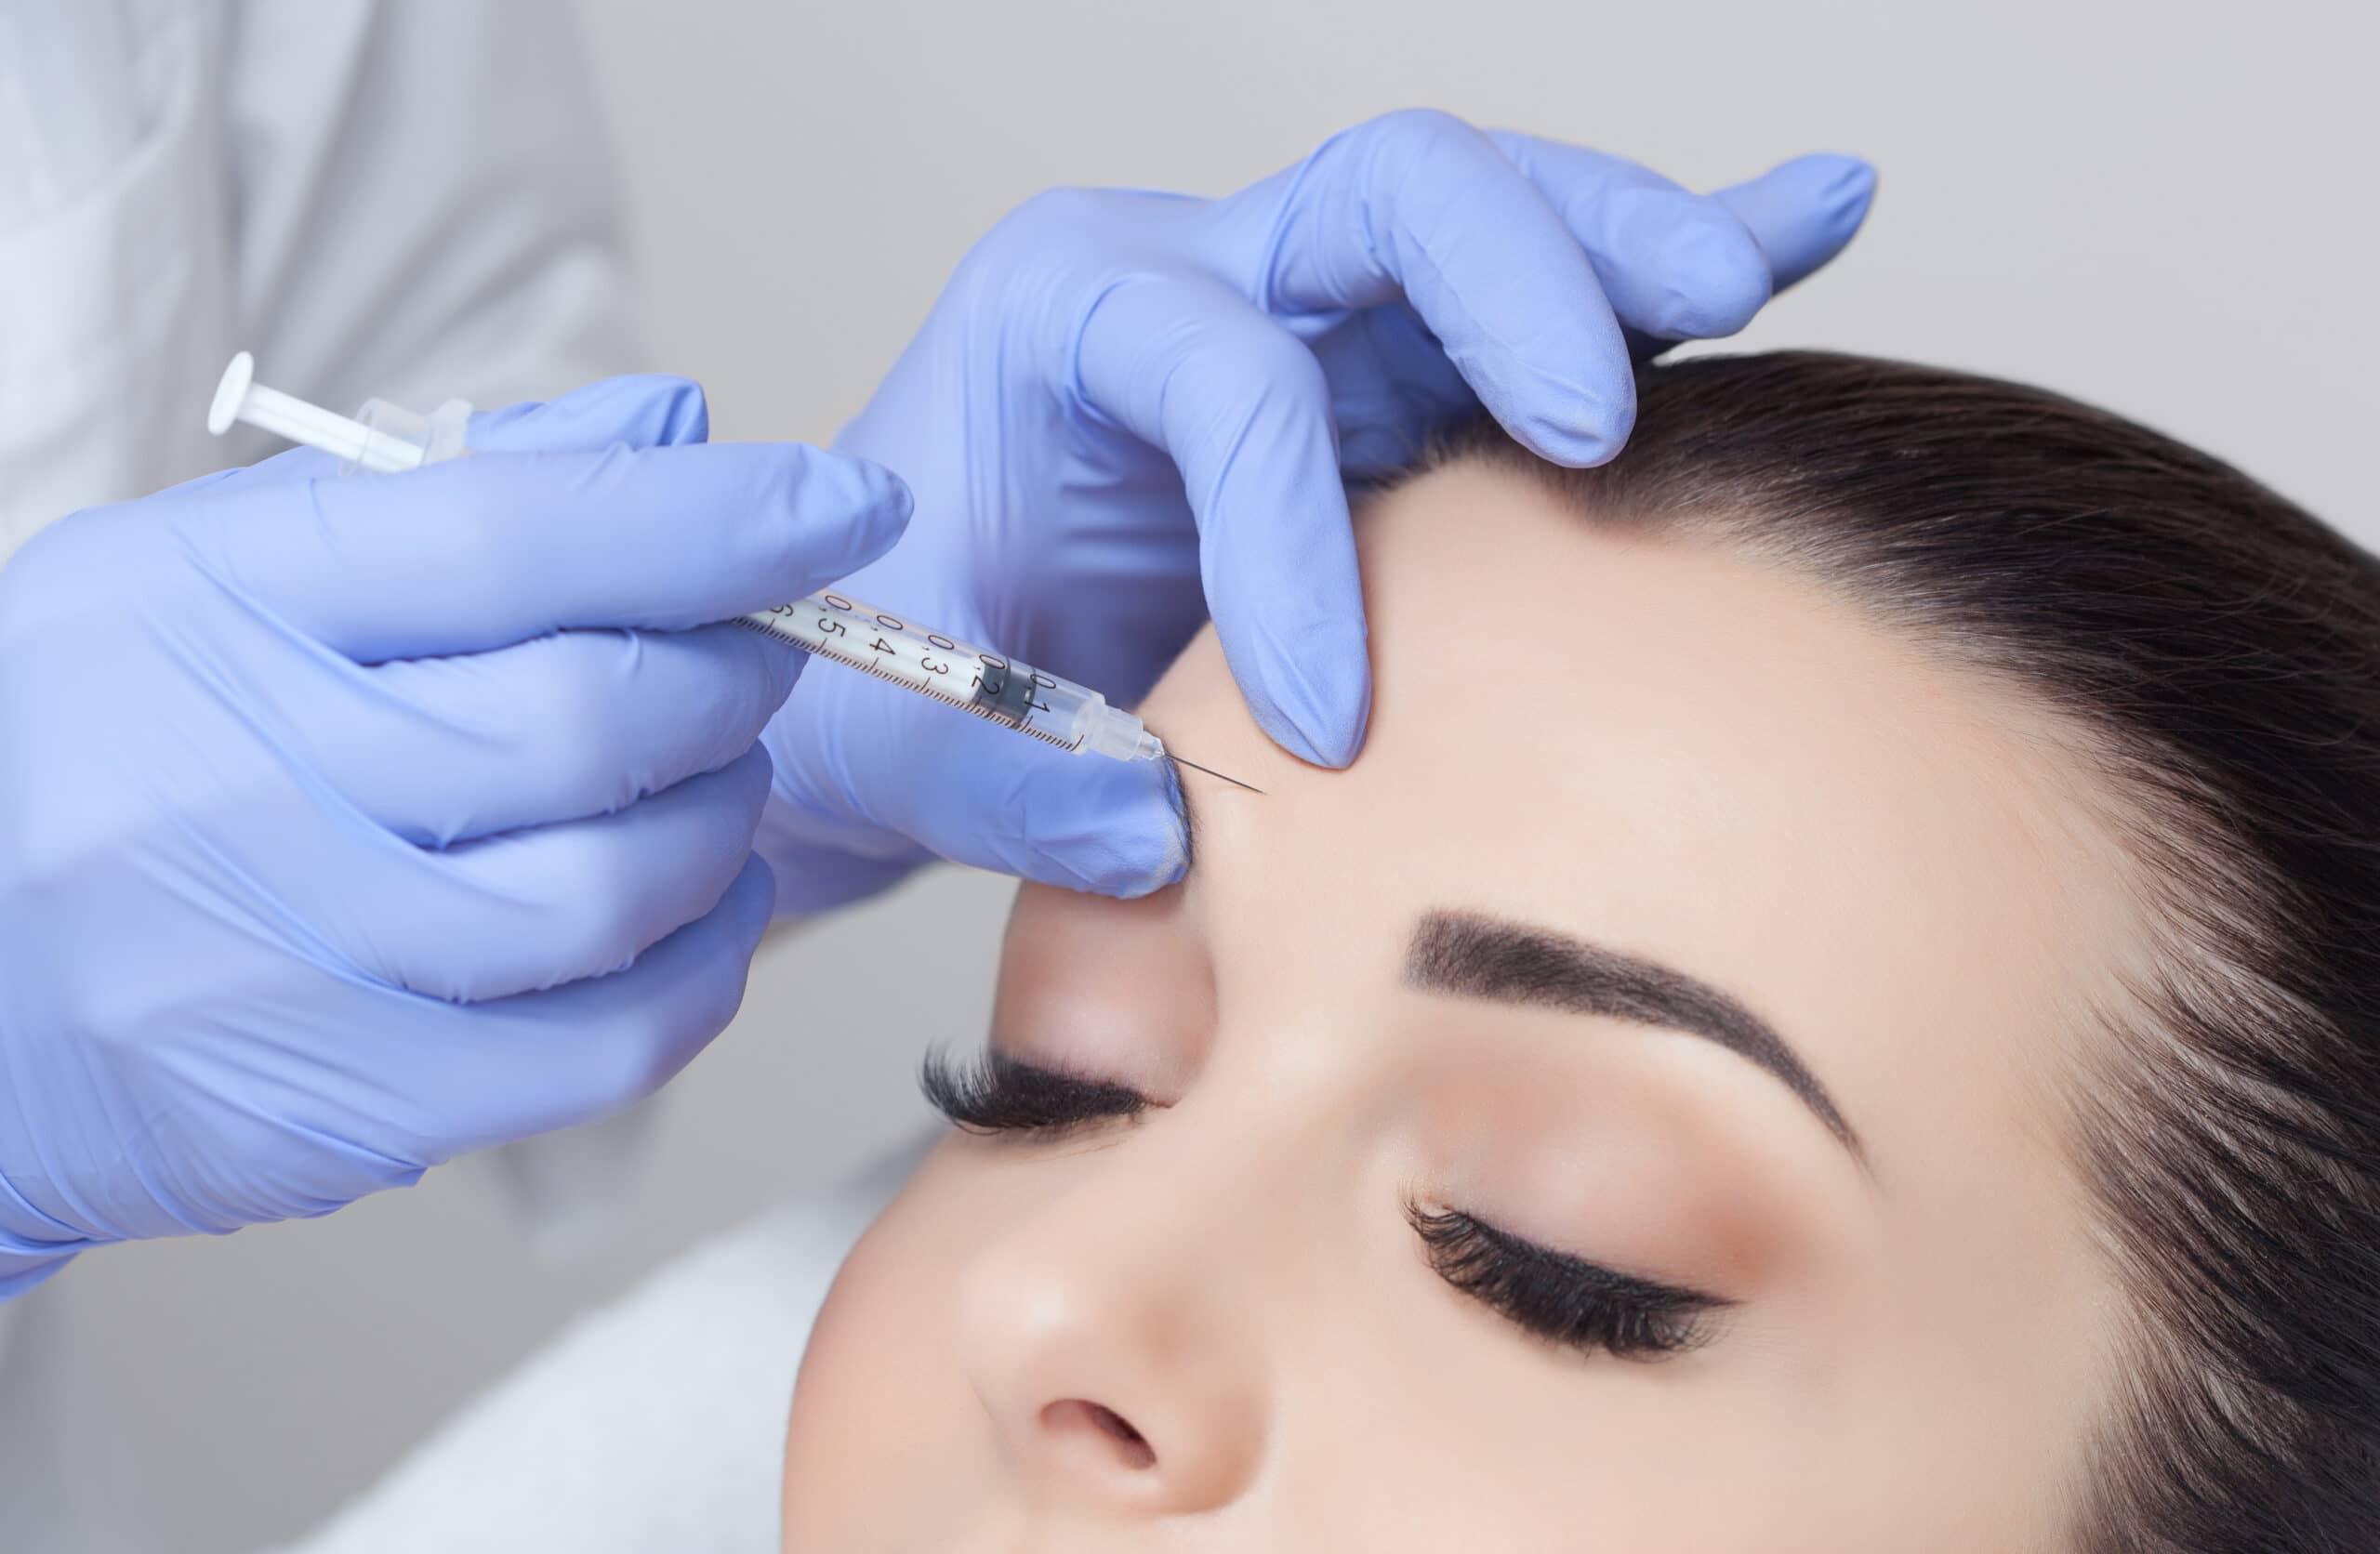 Facial Cosmetic Procedures